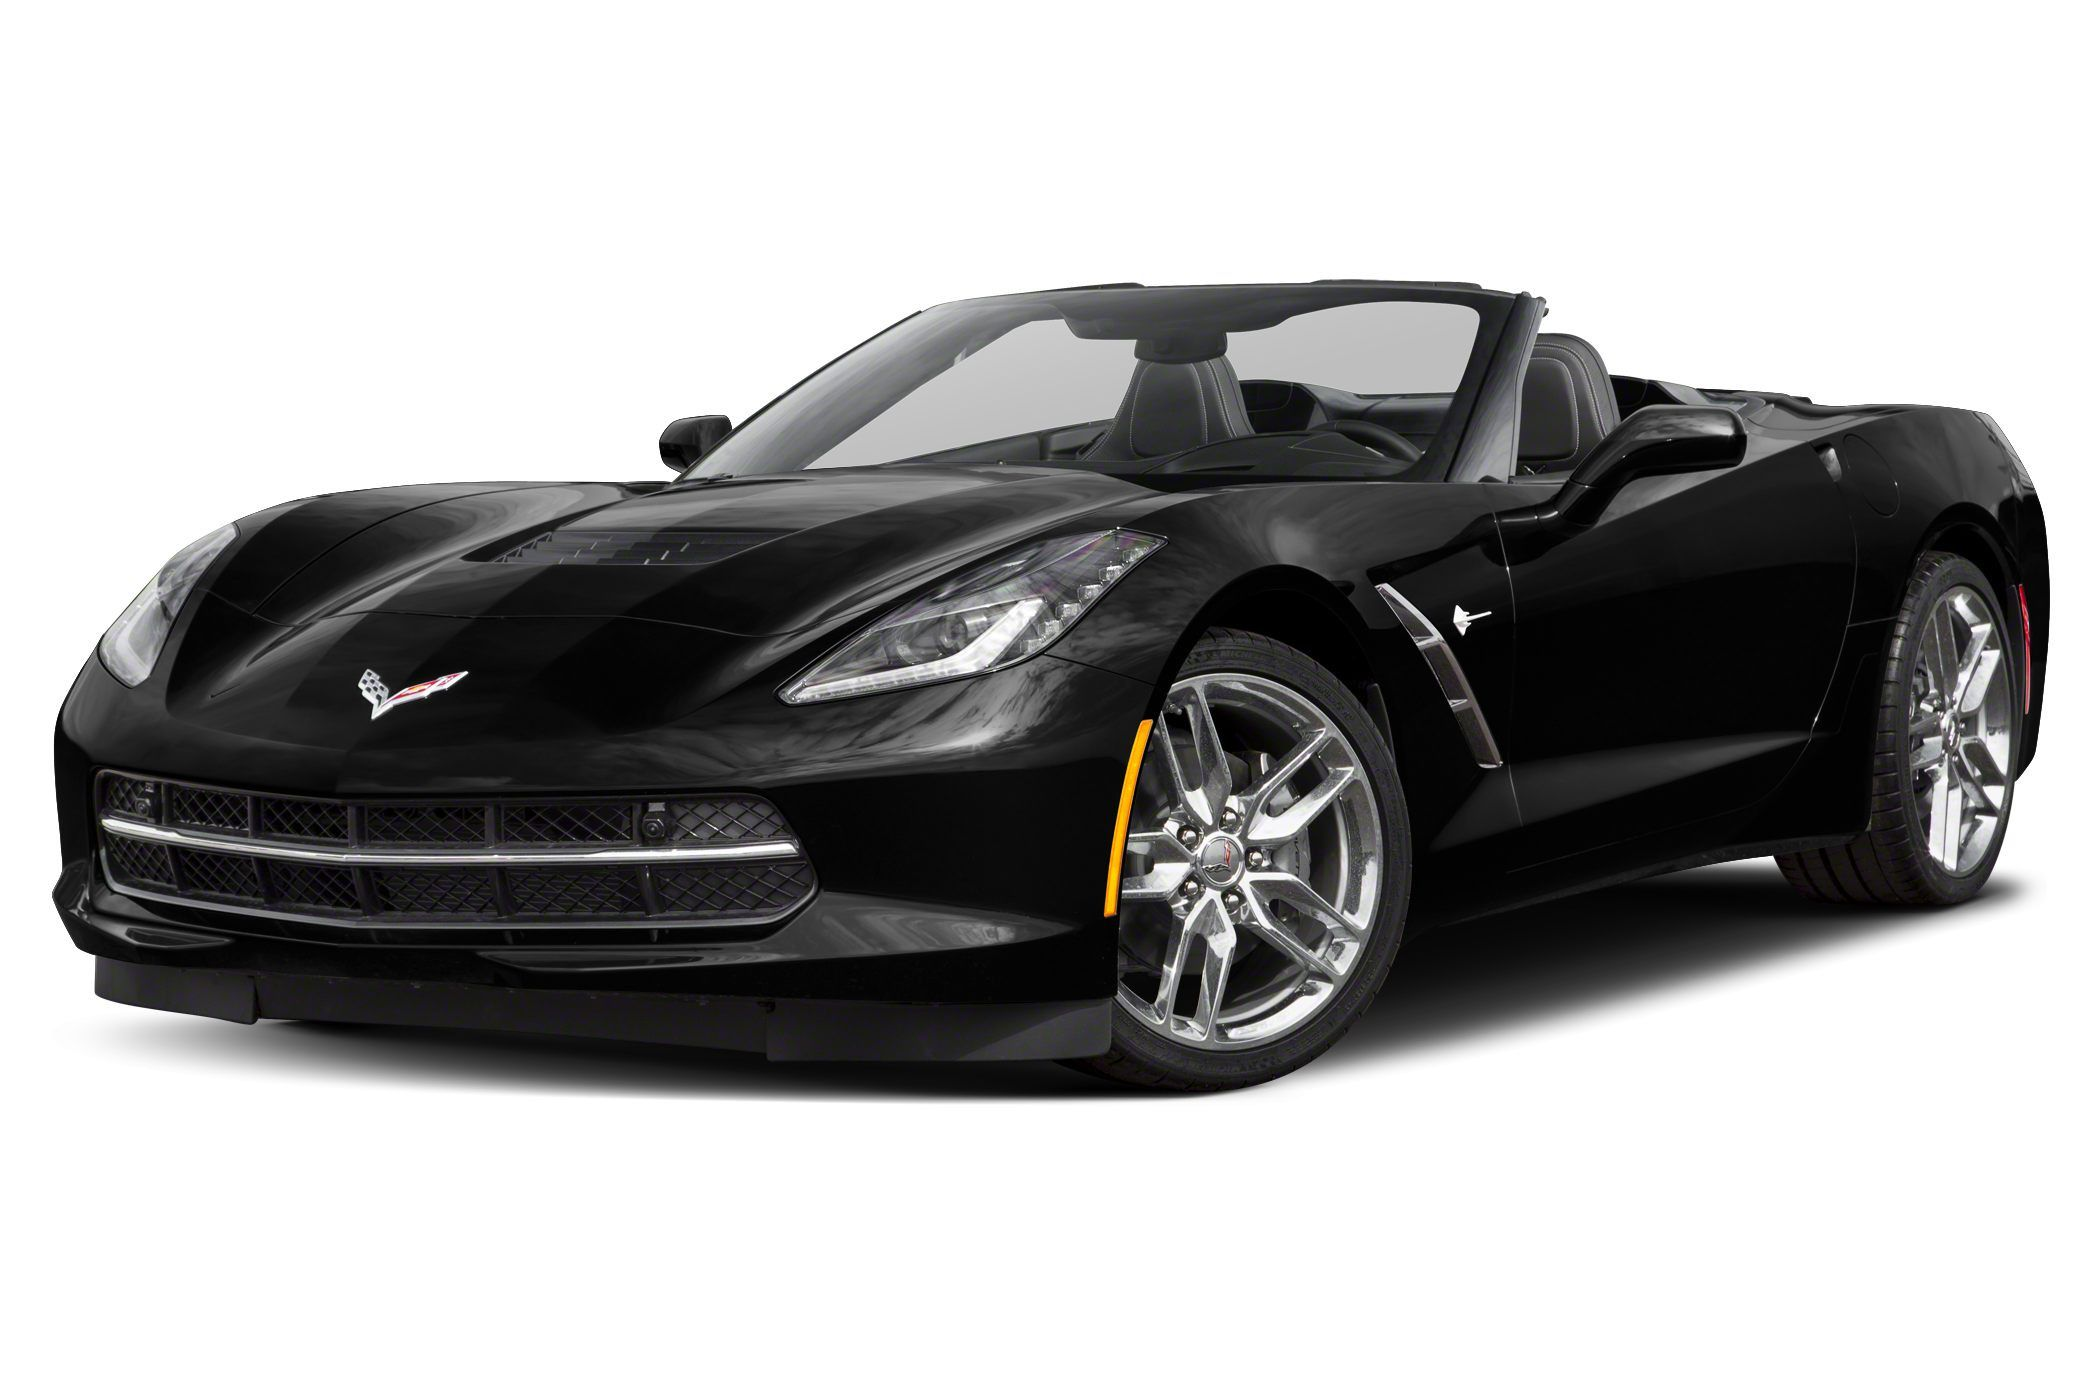 2019 Chevrolet Corvette Stingray 2dr Convertible Pricing